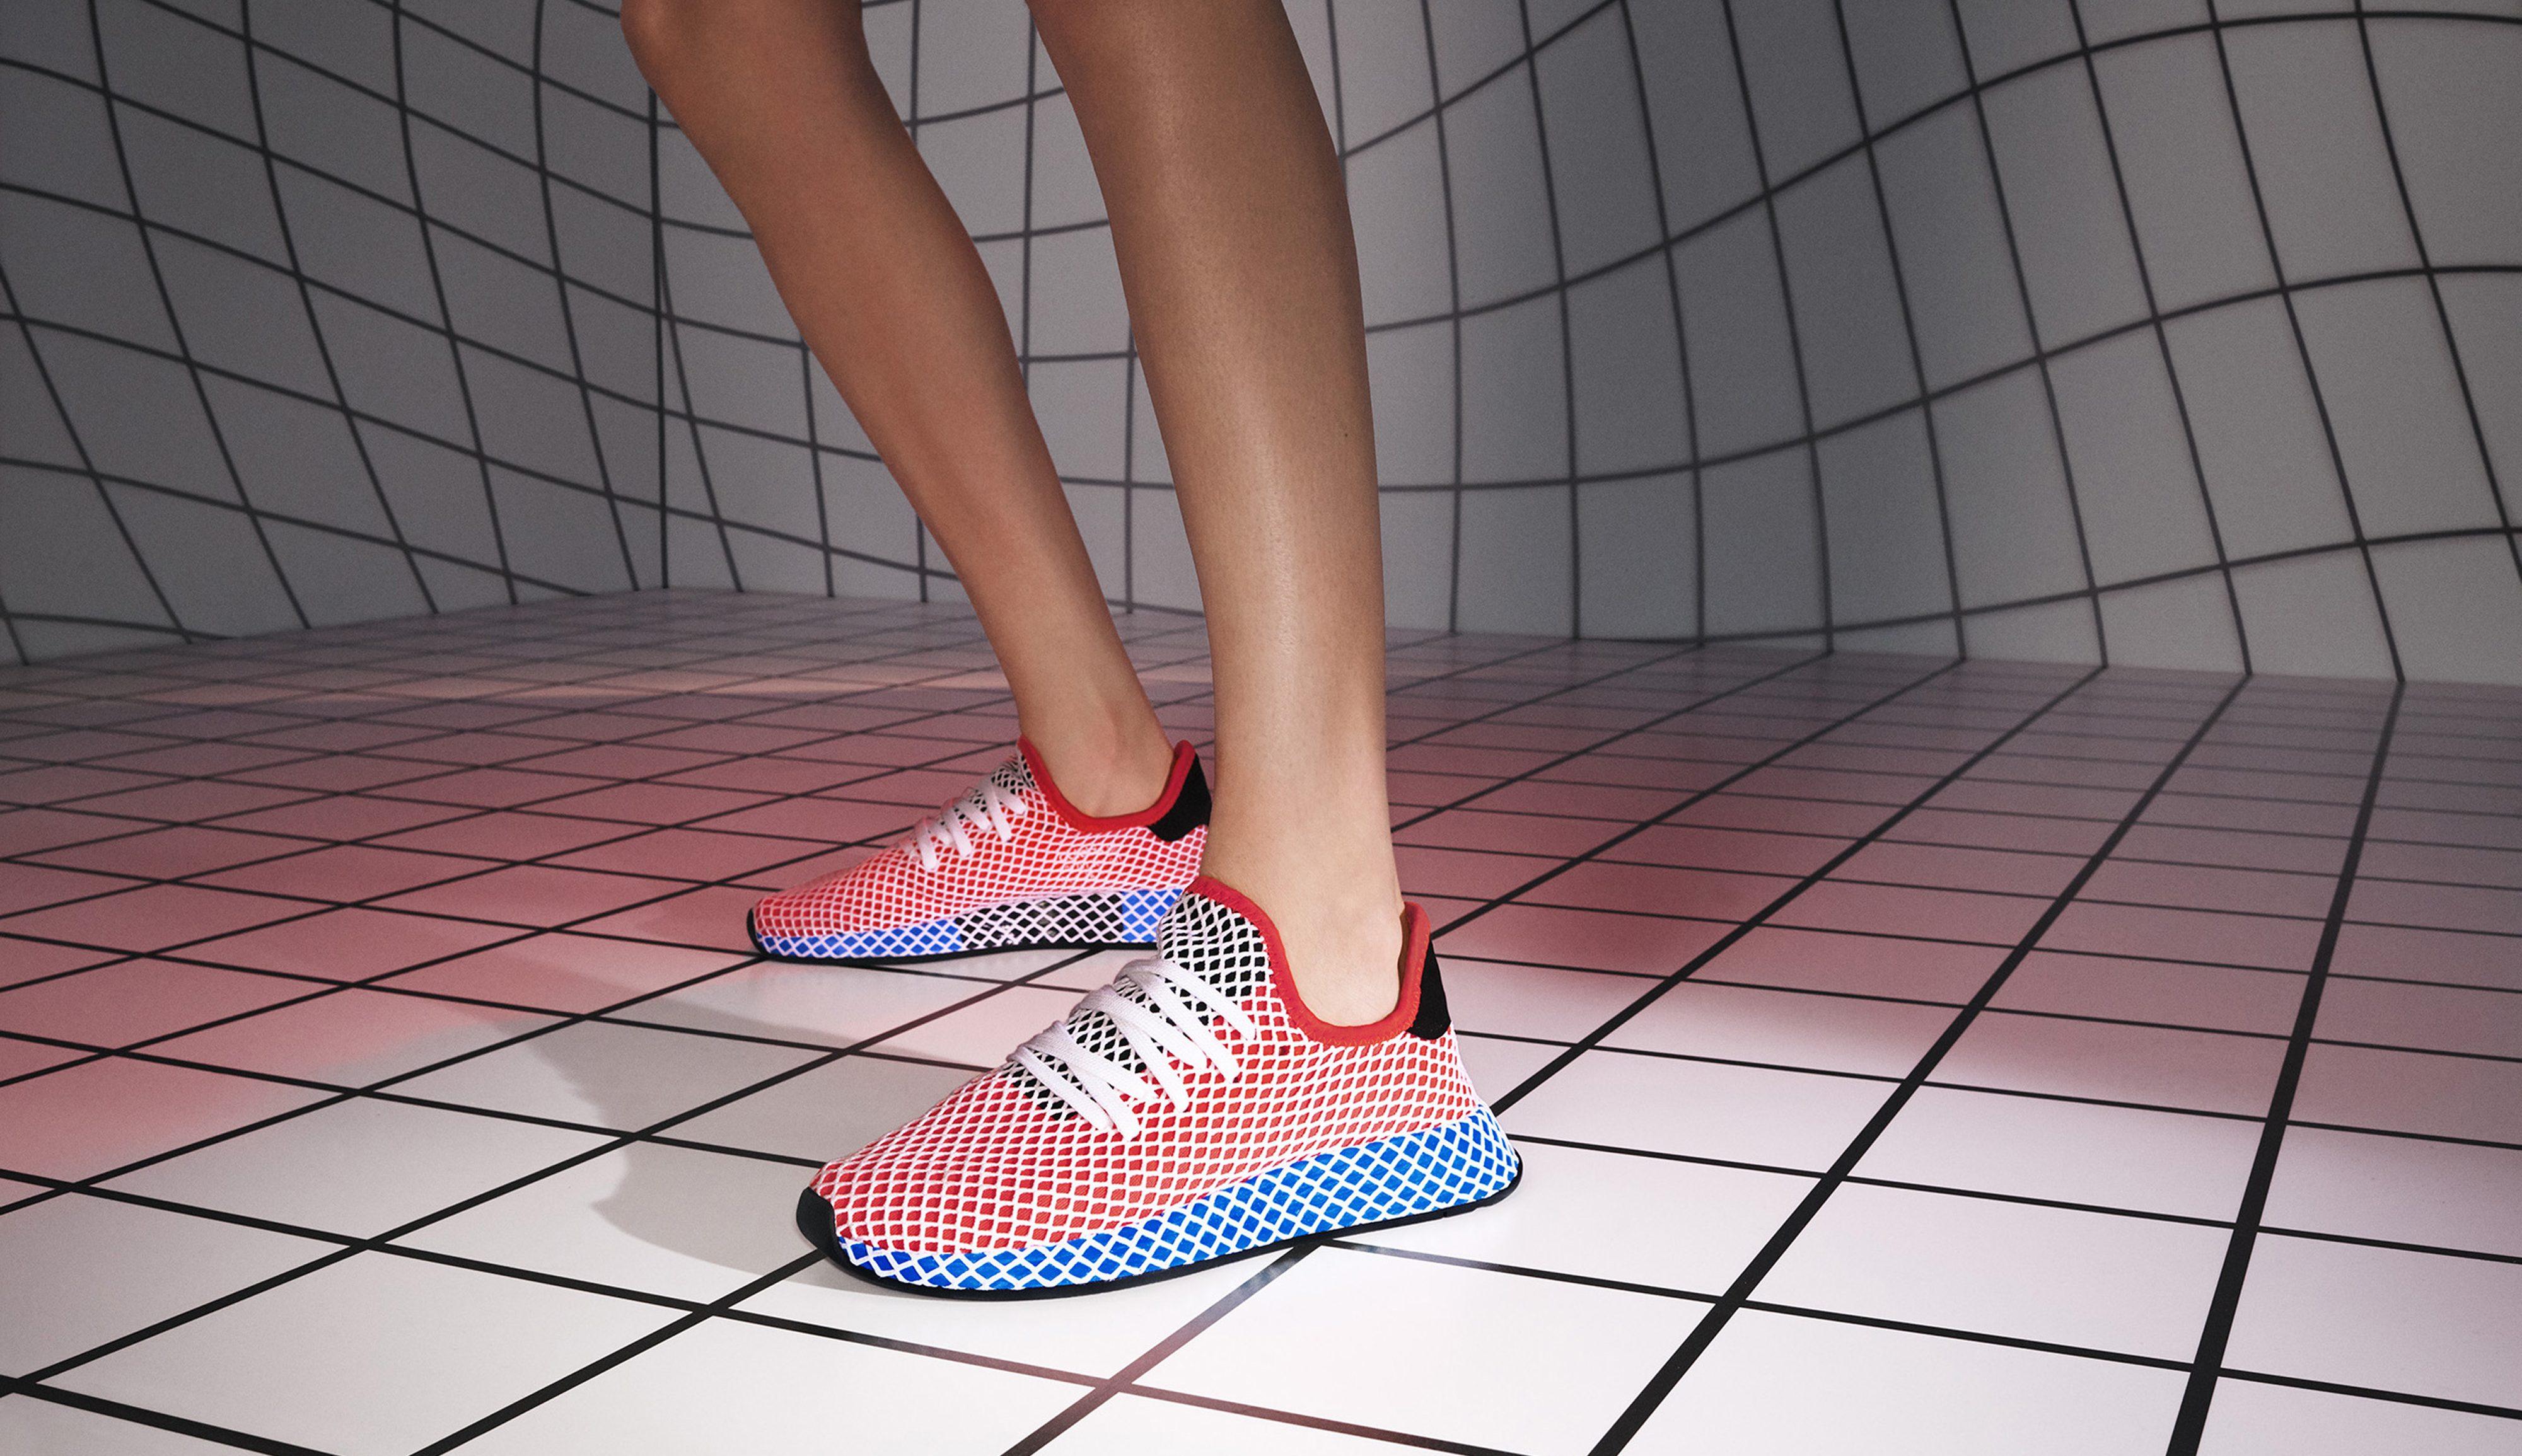 controllare deerupt, nuove scarpe da adidas originali